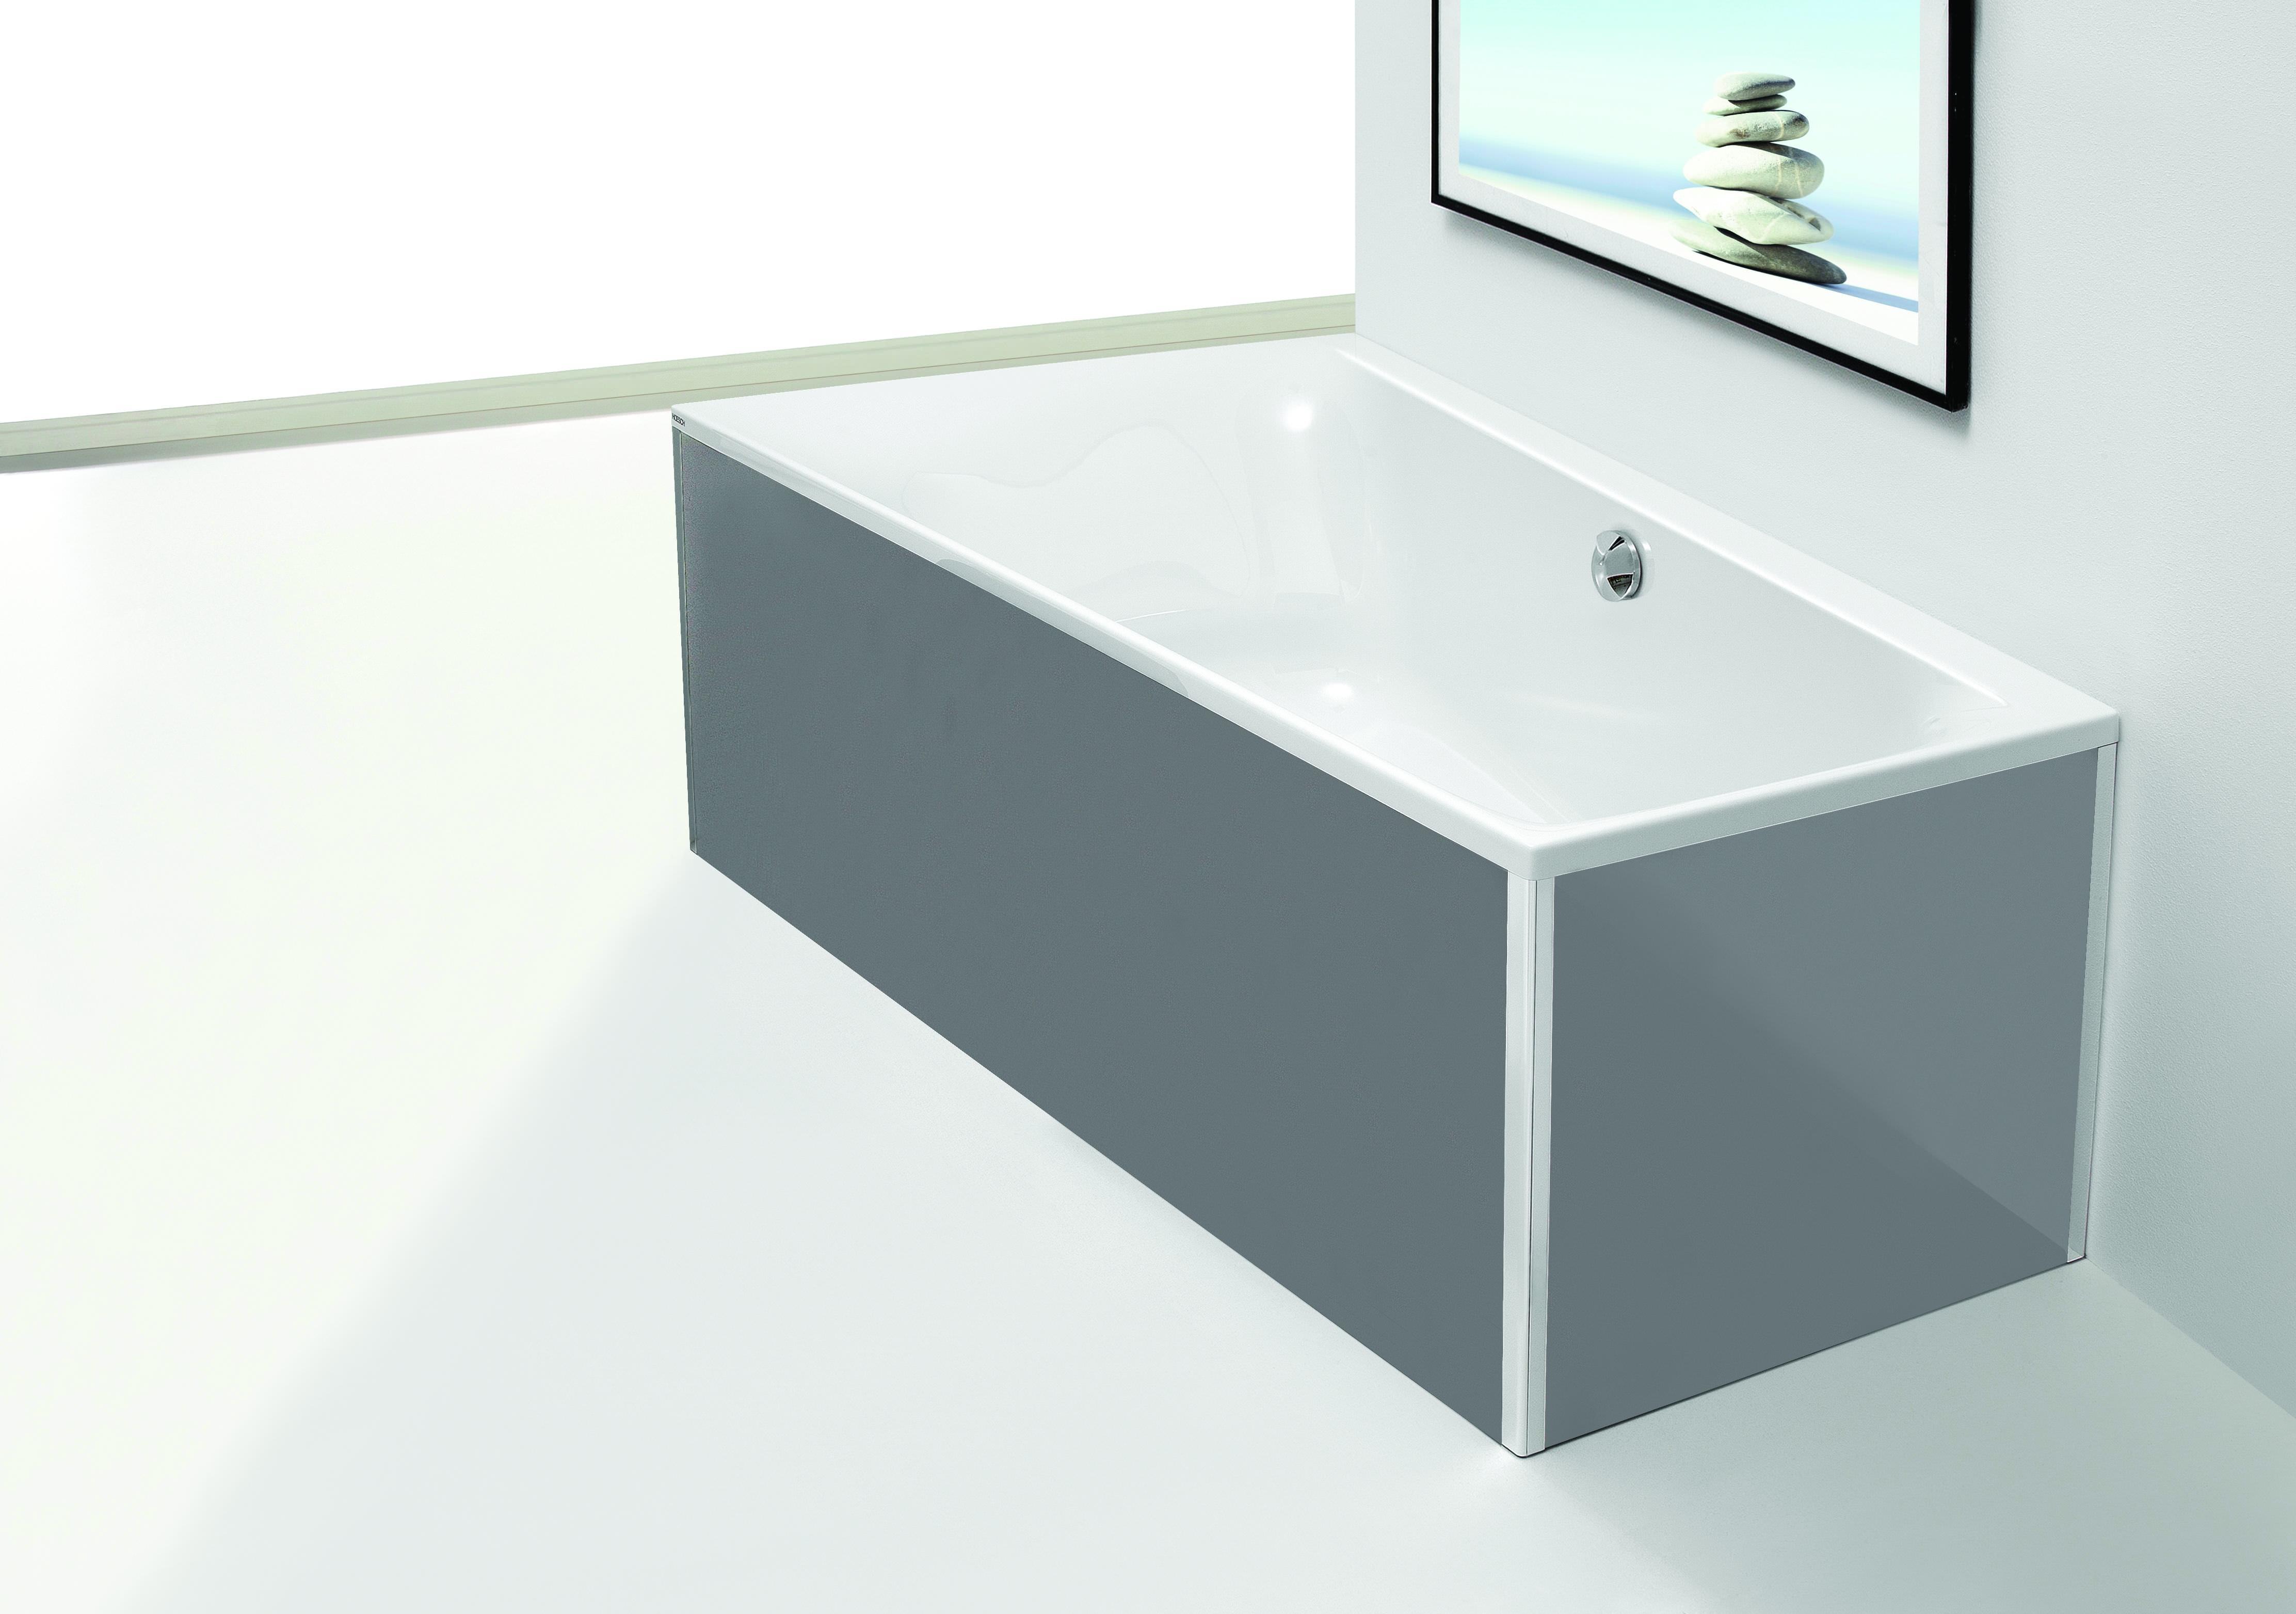 hoesch thasos glasverkleidung vorwandvariante f r. Black Bedroom Furniture Sets. Home Design Ideas